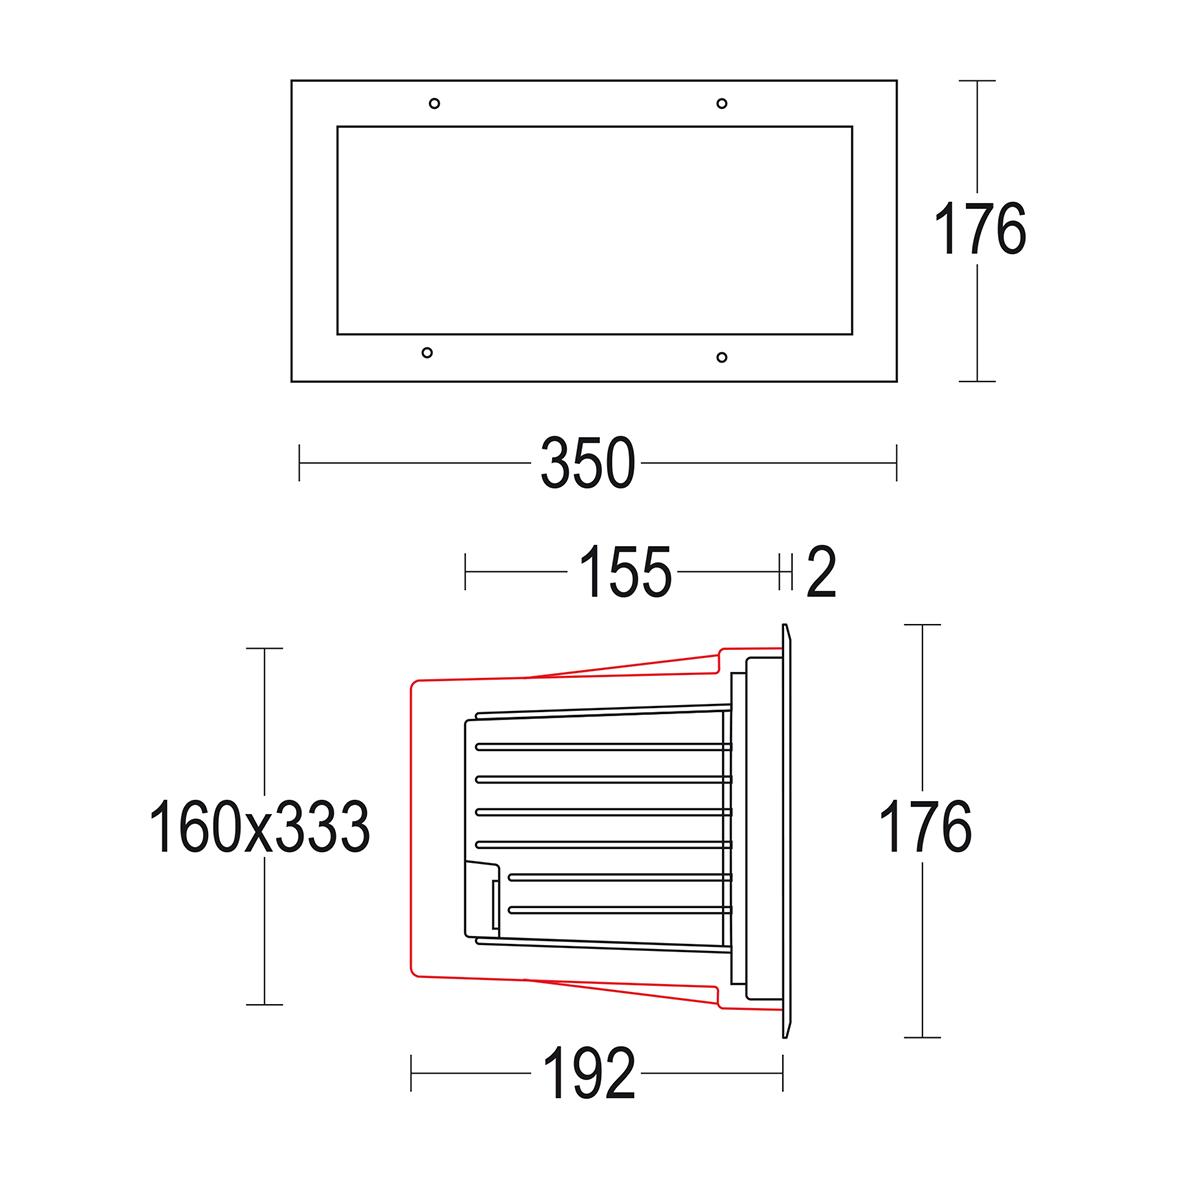 чертеж Maximargin wall 350x175 Ghidini уличный светильник GH5629.BRXA300EN